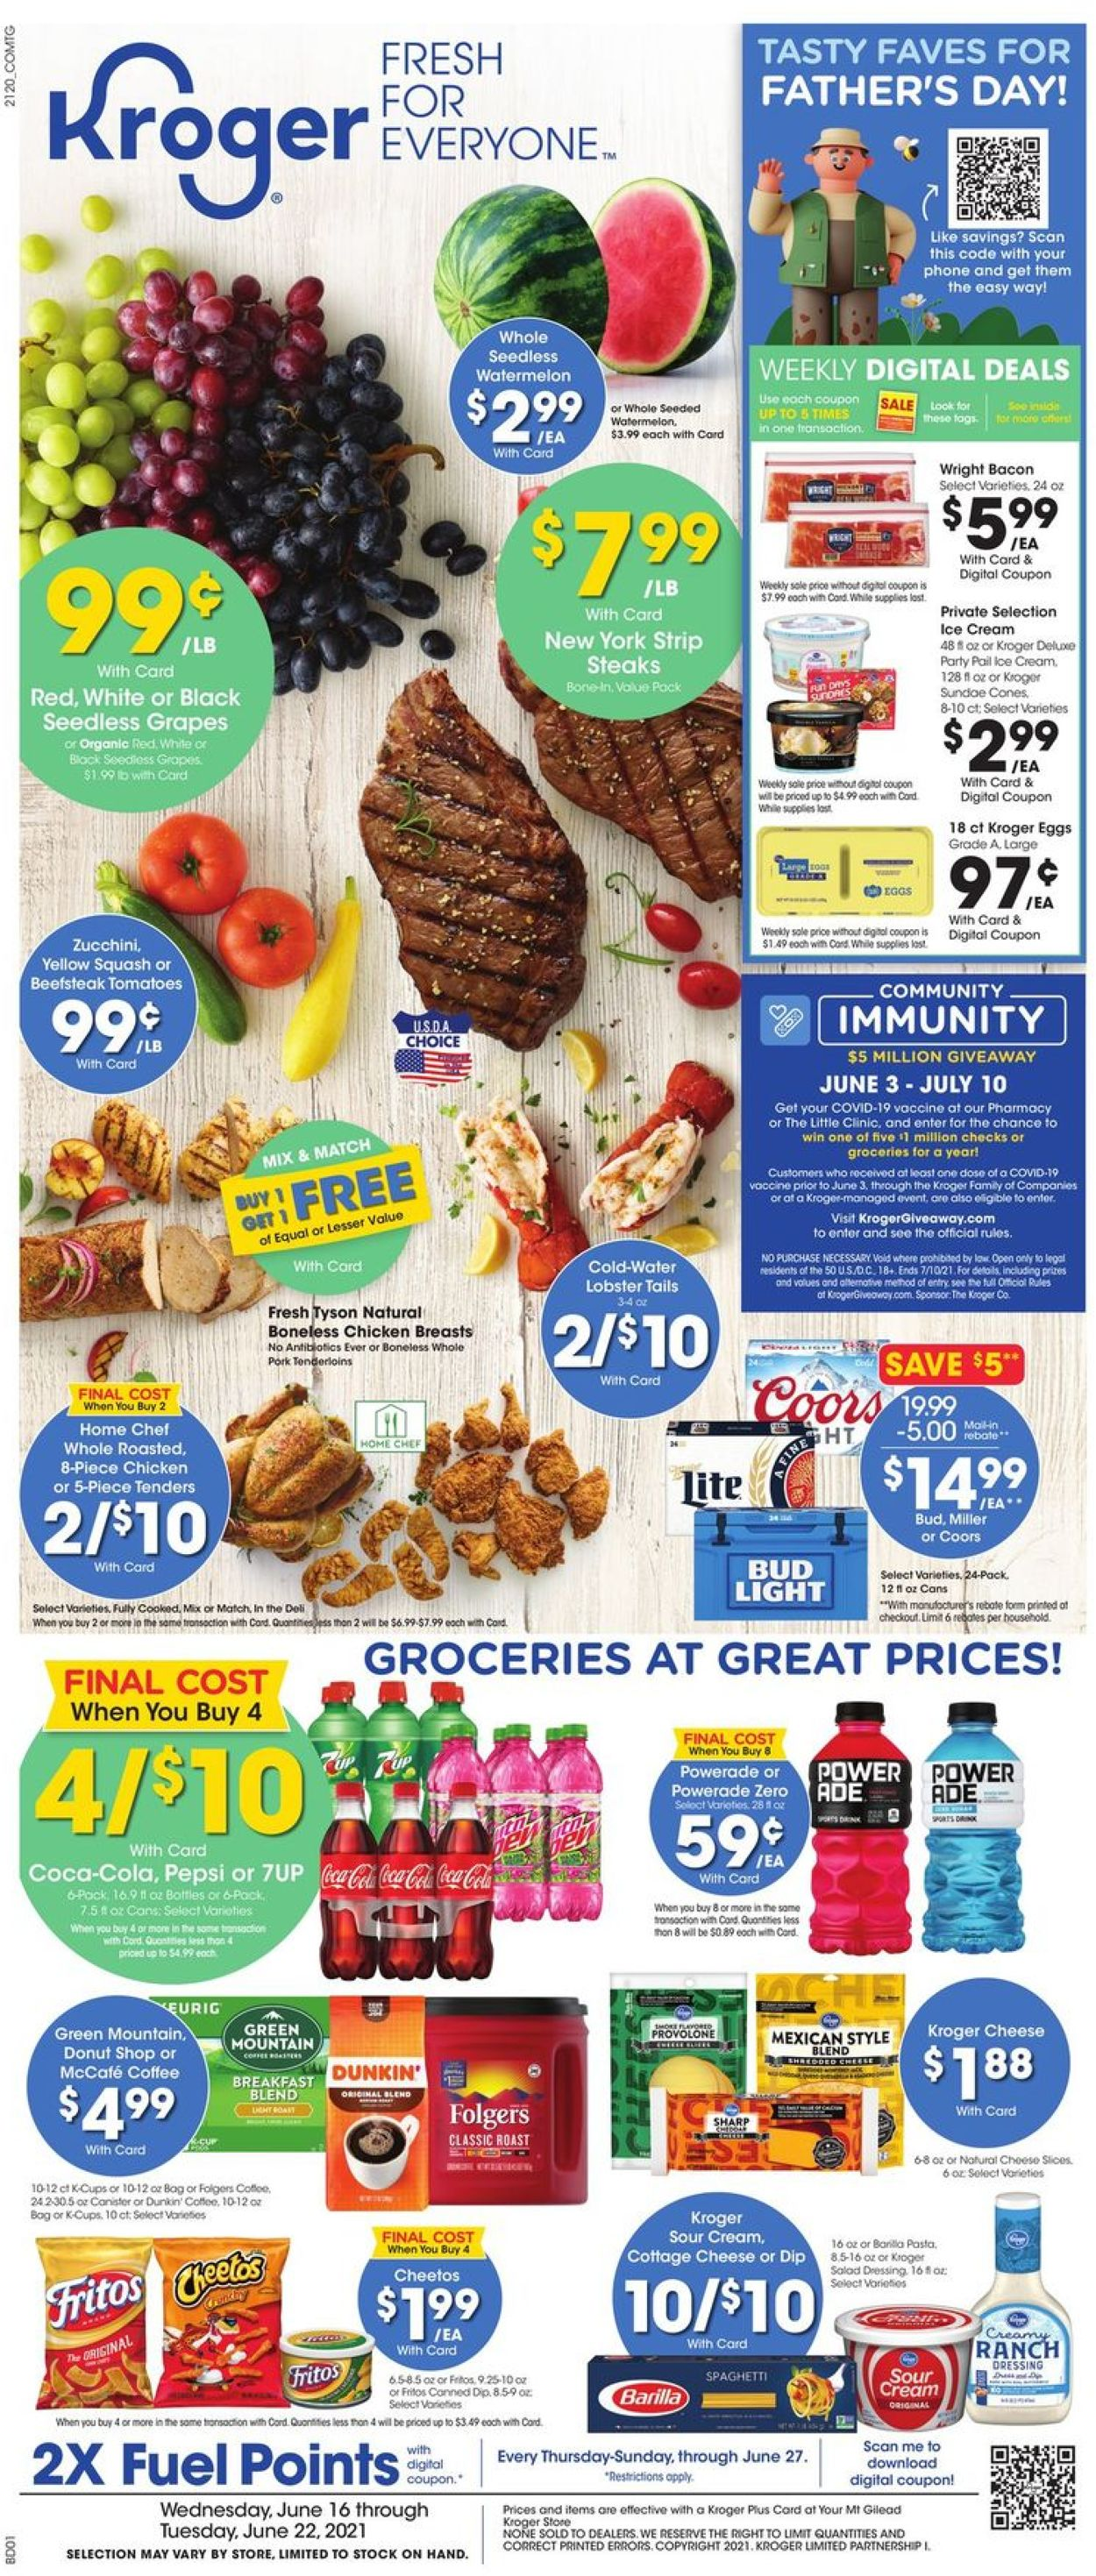 Kroger Weekly Ad Circular - valid 06/16-06/22/2021